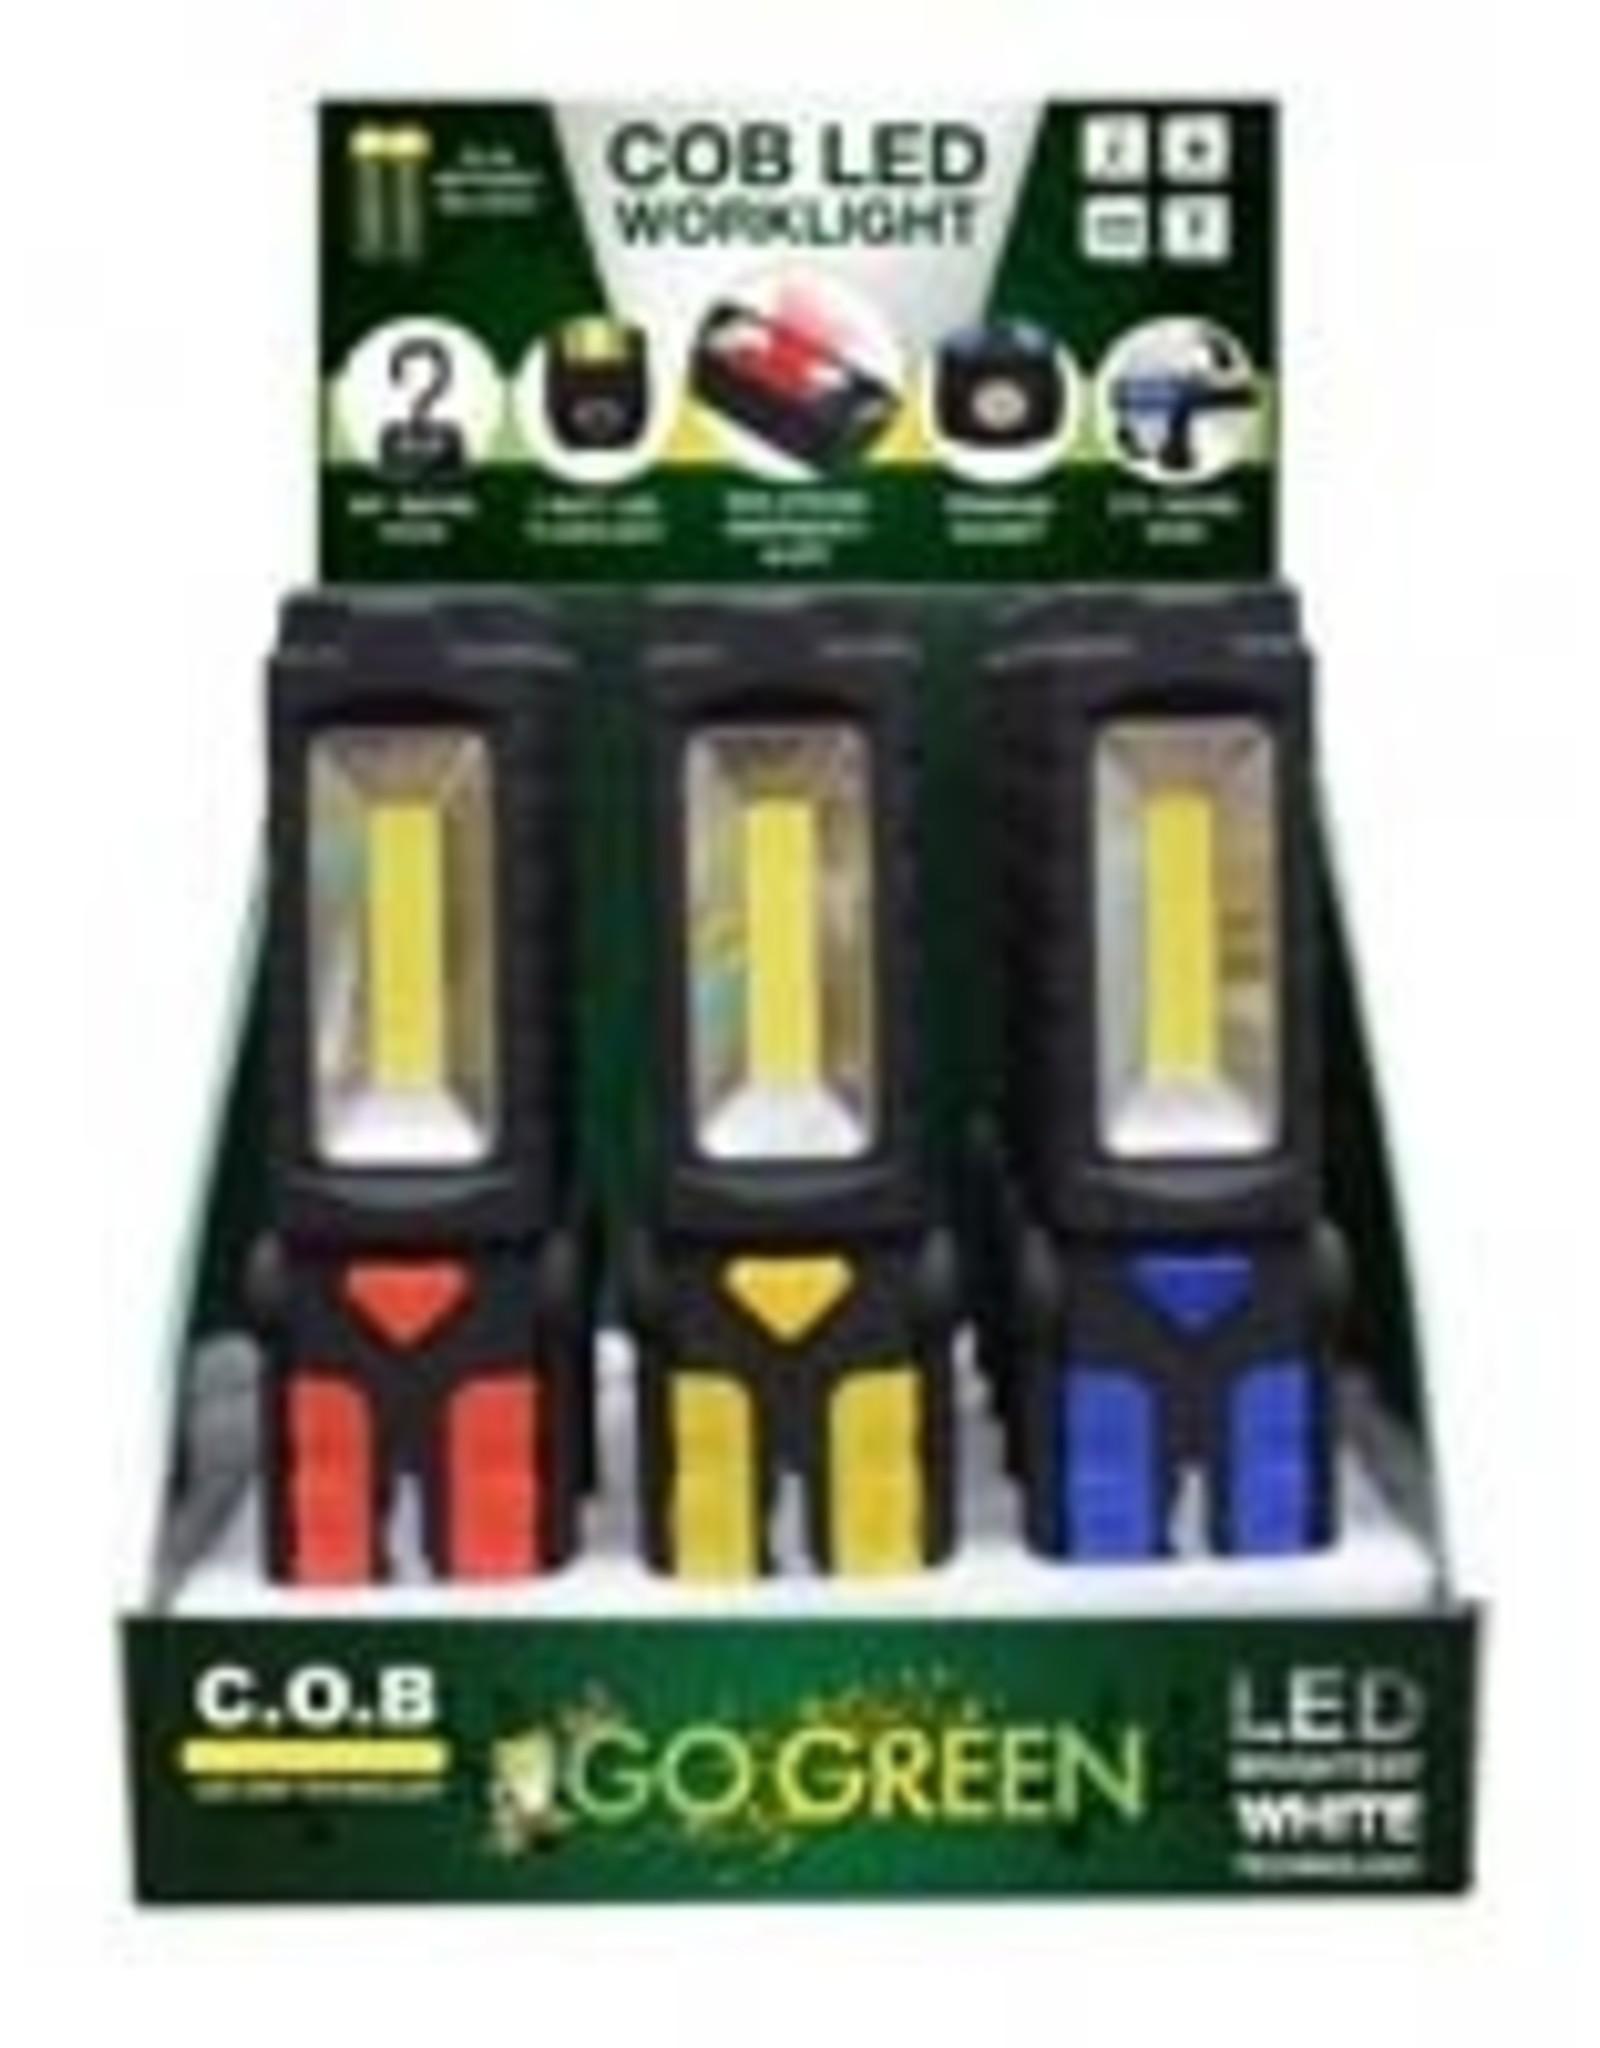 Go Green Power COB LED Led Flashlight/Worklight